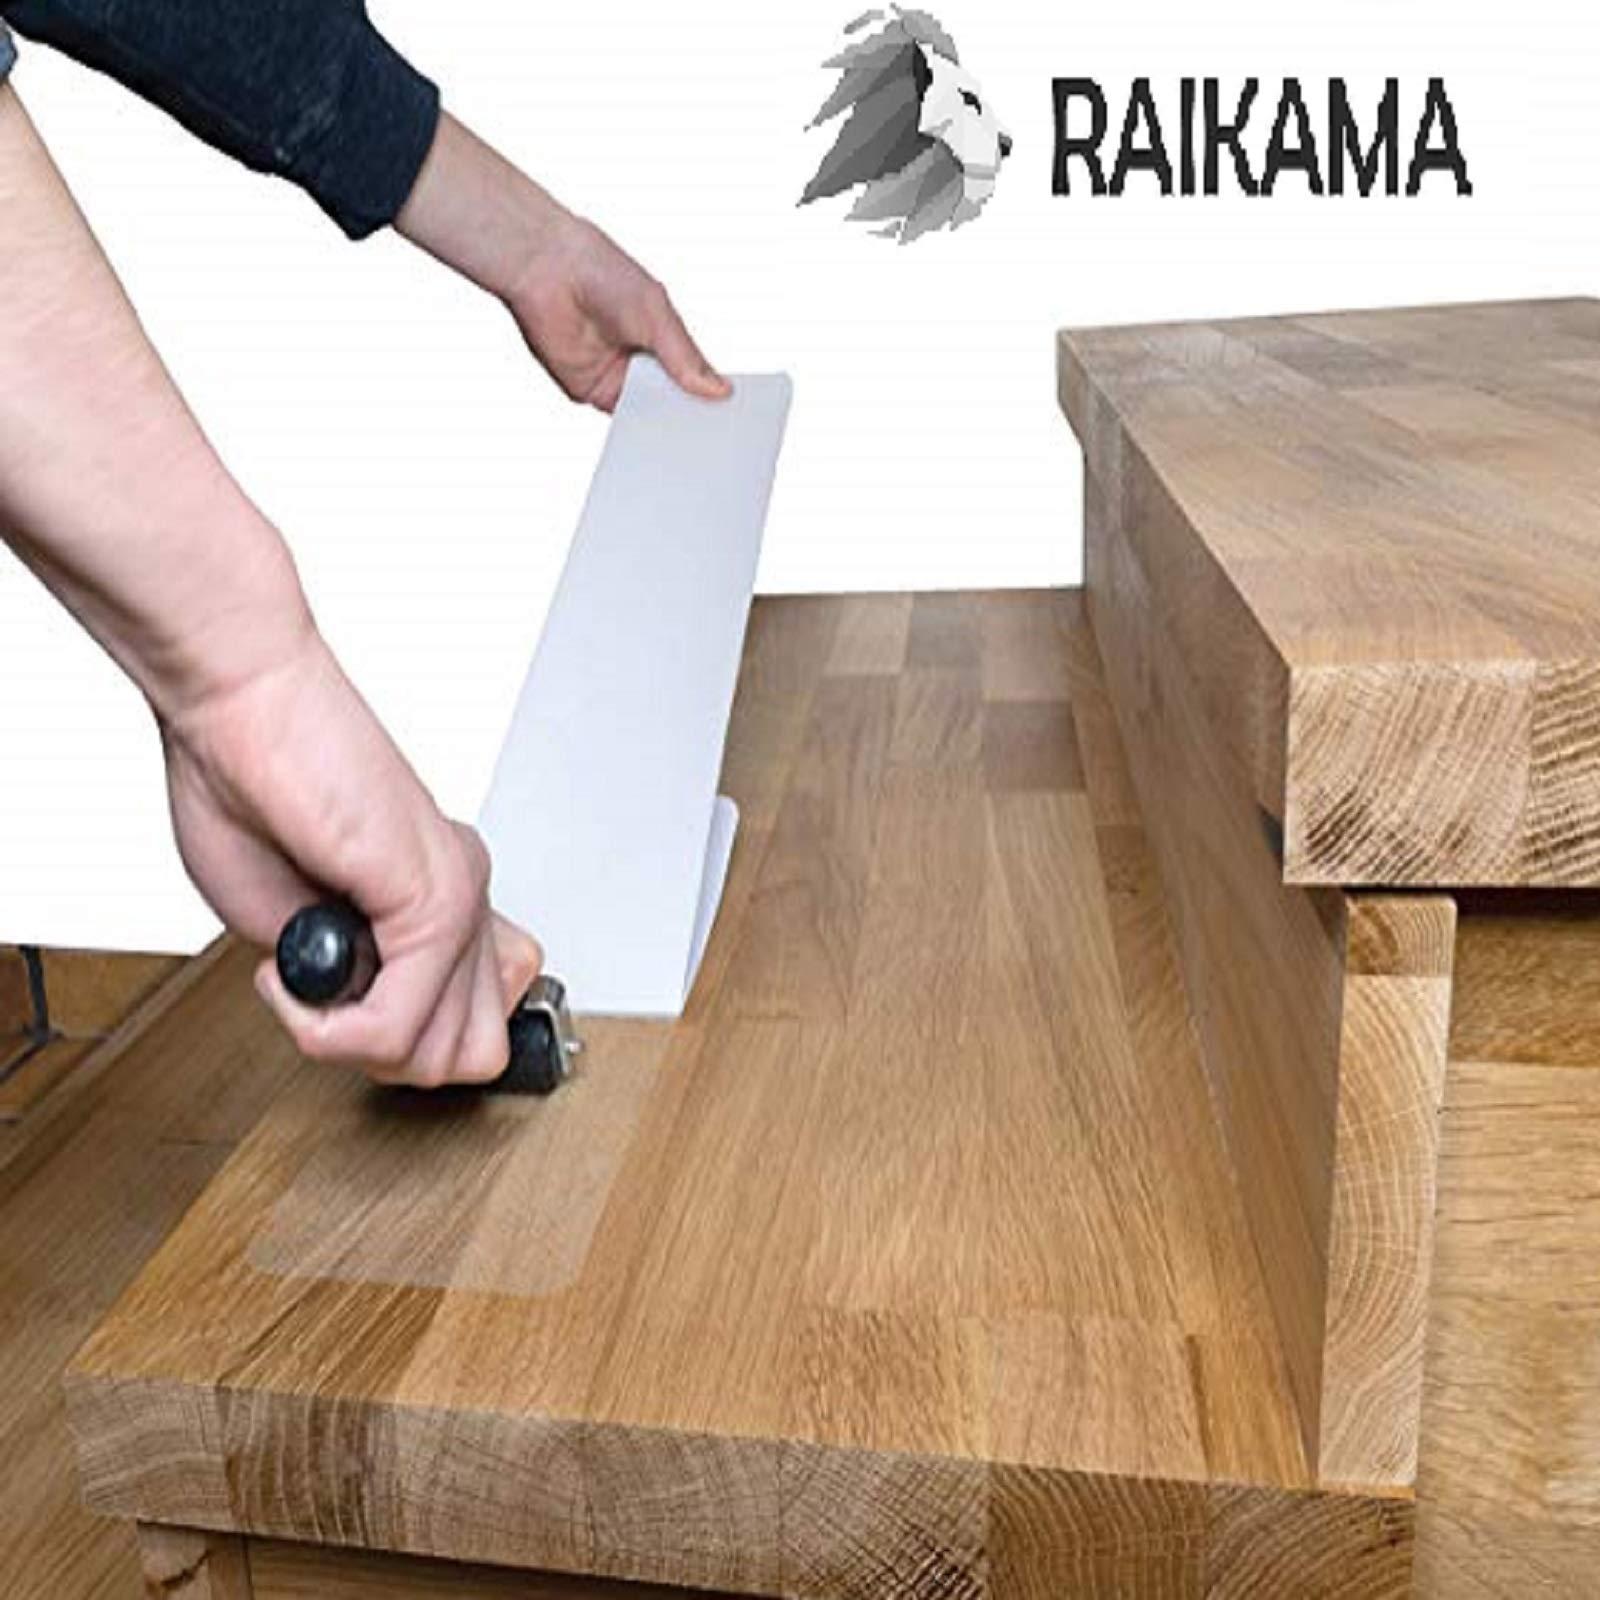 Cinta Antideslizante Transparente 15 un. 10x61cm. RAIKAMA